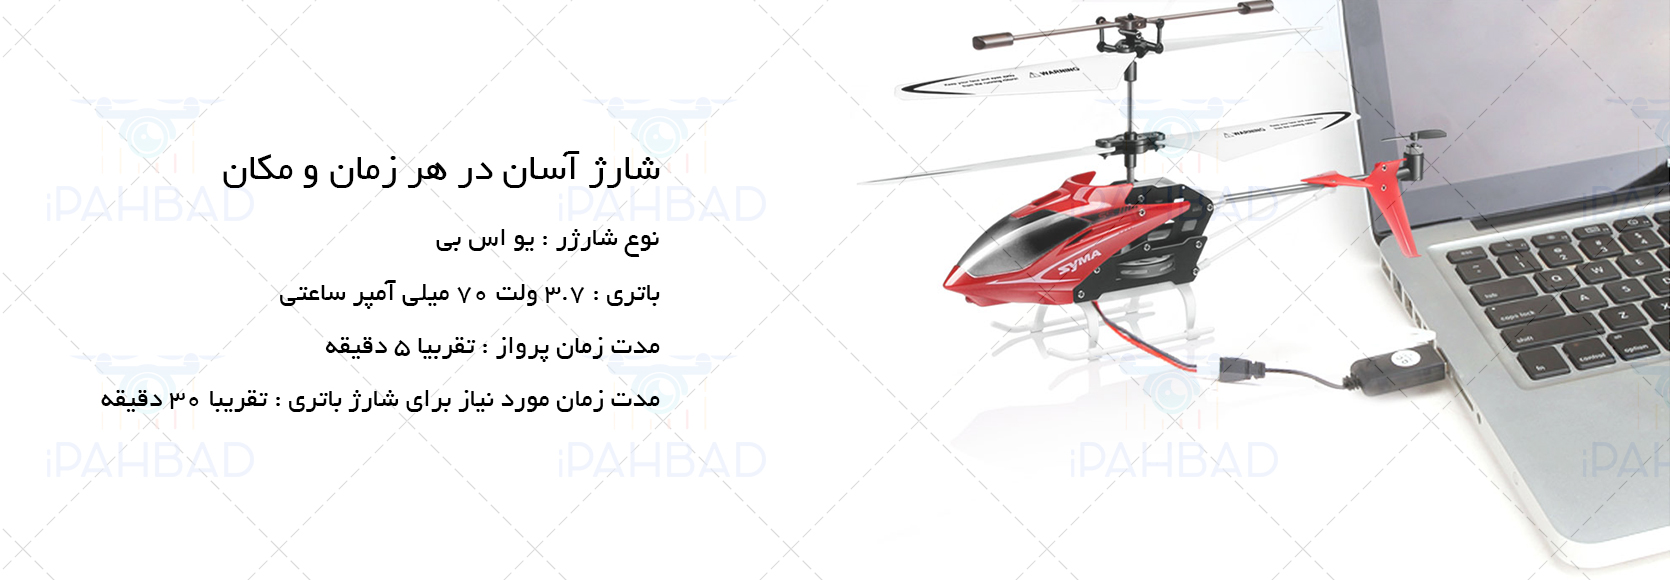 هلیکوپتر کنترلی سایما,هلیکوپتر کنترلی سیما,هلیکوپتر کنترلی,هلیکوپتر کنترلی سیما S5 Speed,هلیکوپتر کنترلی سایما S5 Speed,هلیکوپتر کنترلی Syma S5 Speed,هلیکوپتر کنترلی سایما اس 5 اسپید,هلیکوپتر کنترلی سیما اس 5 اسپید